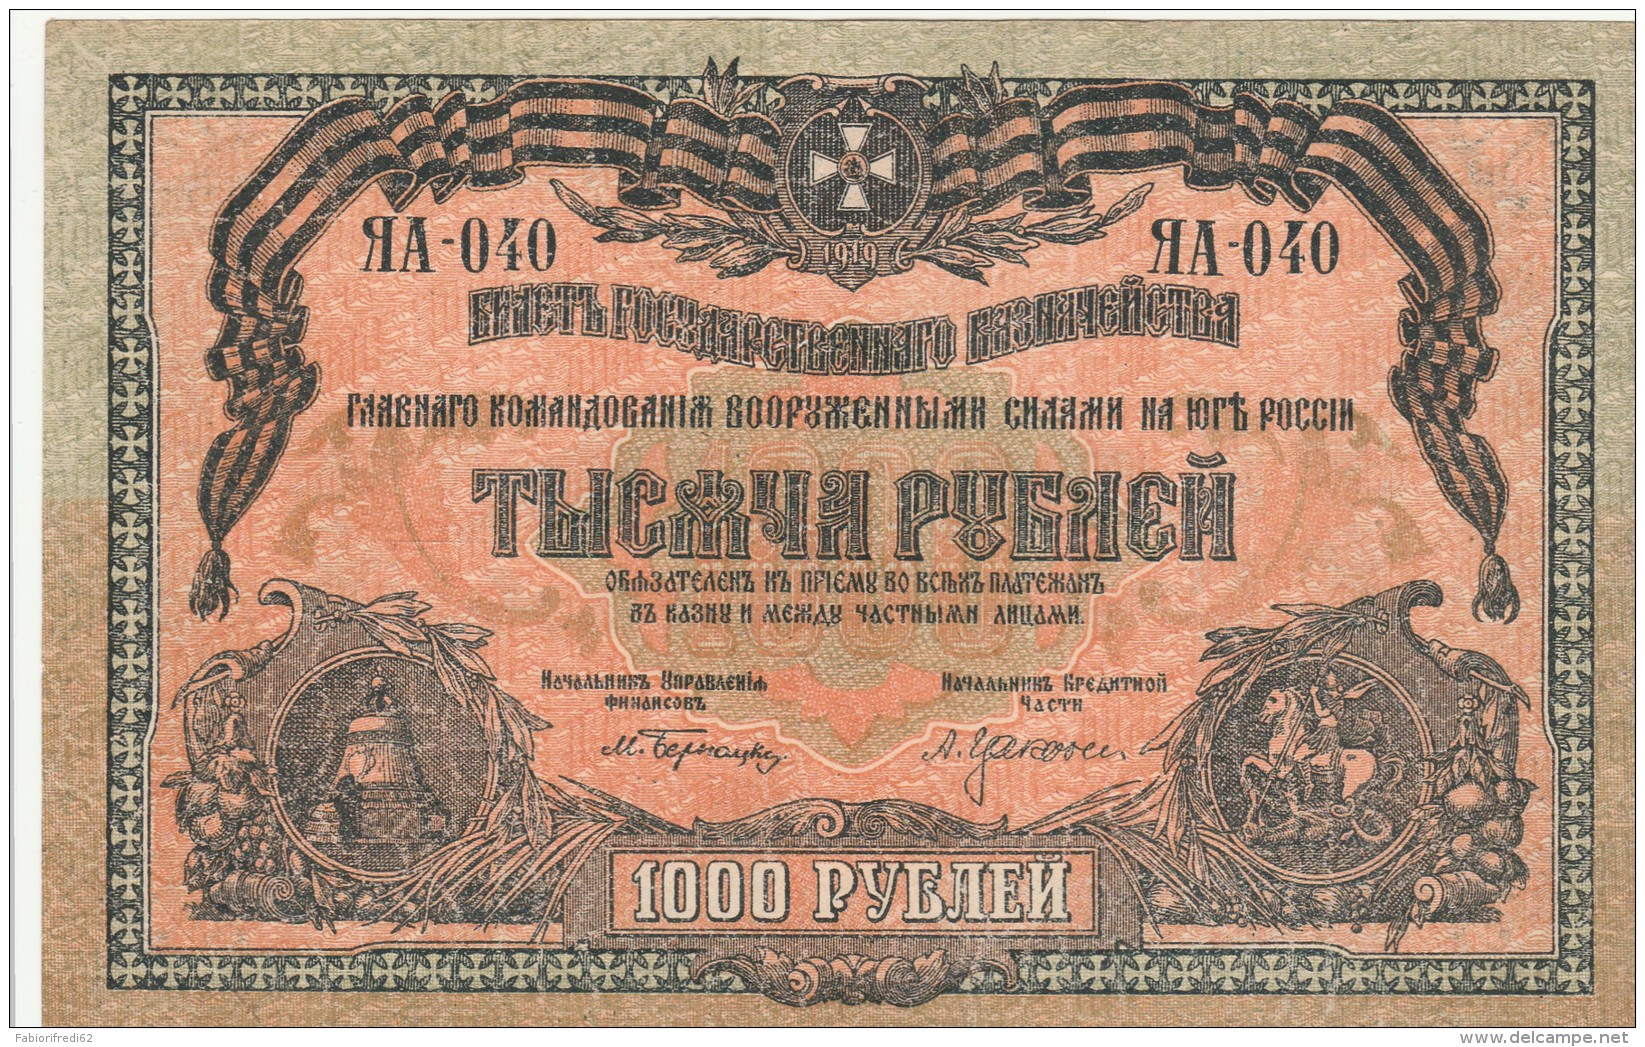 RUSSIA 1919 1000 RUBLI -XF+ (BA122 - Russland